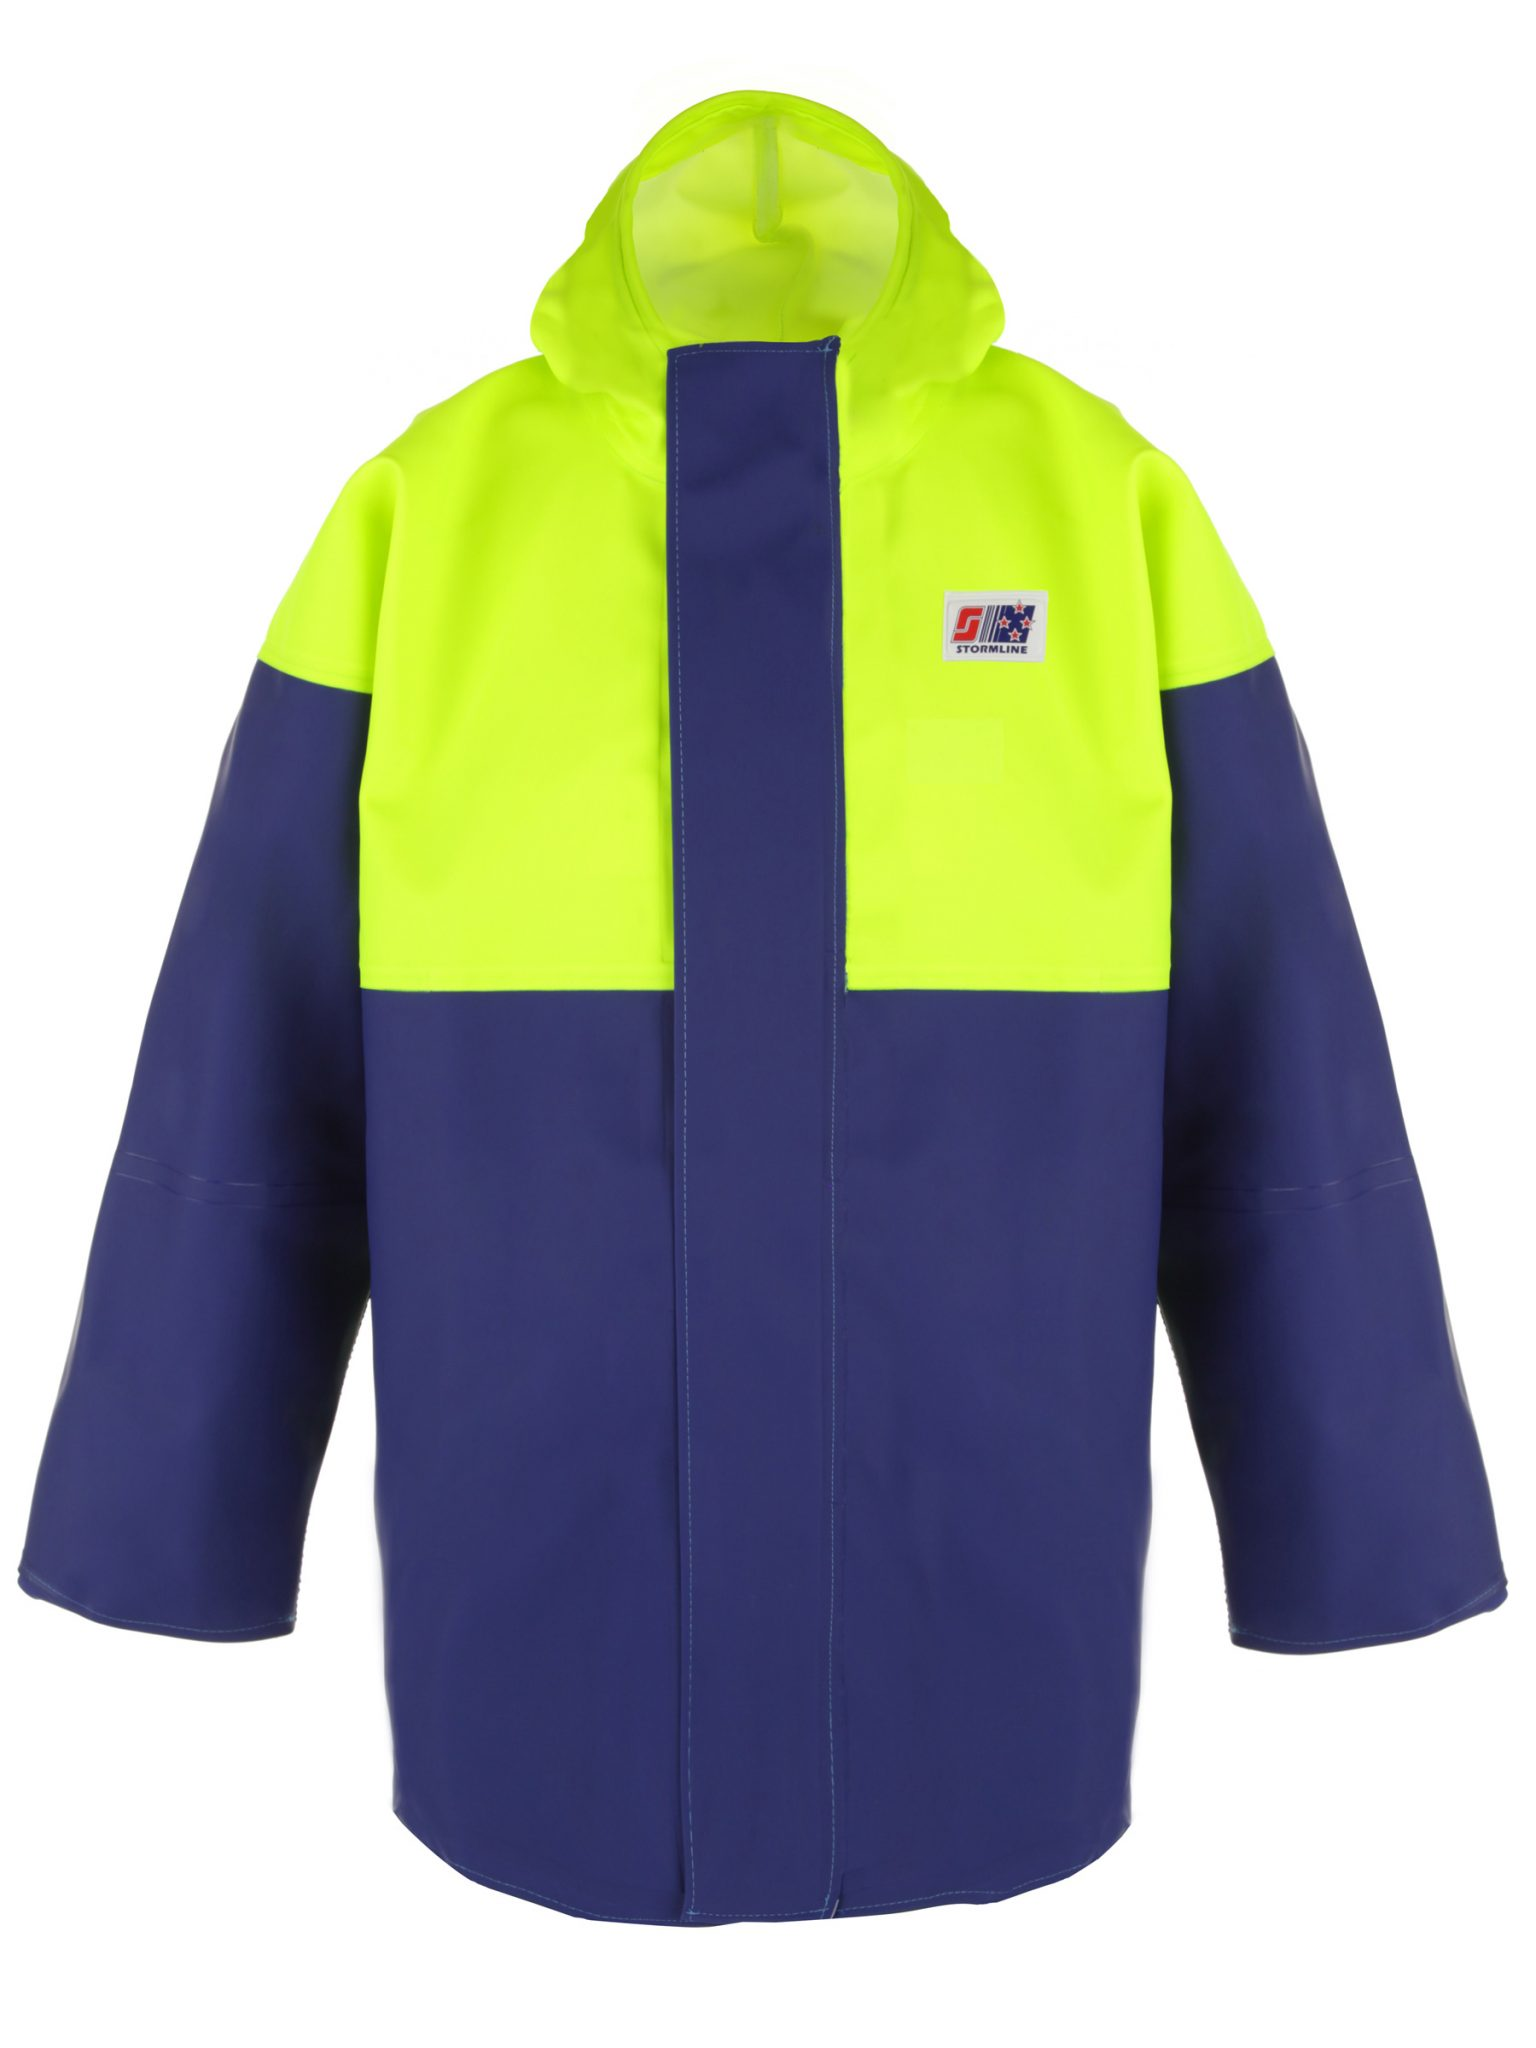 Pressure washing jacket - Stormline Crew 211 Heavy Duty Commercial Fishing Rain Gear Jacket